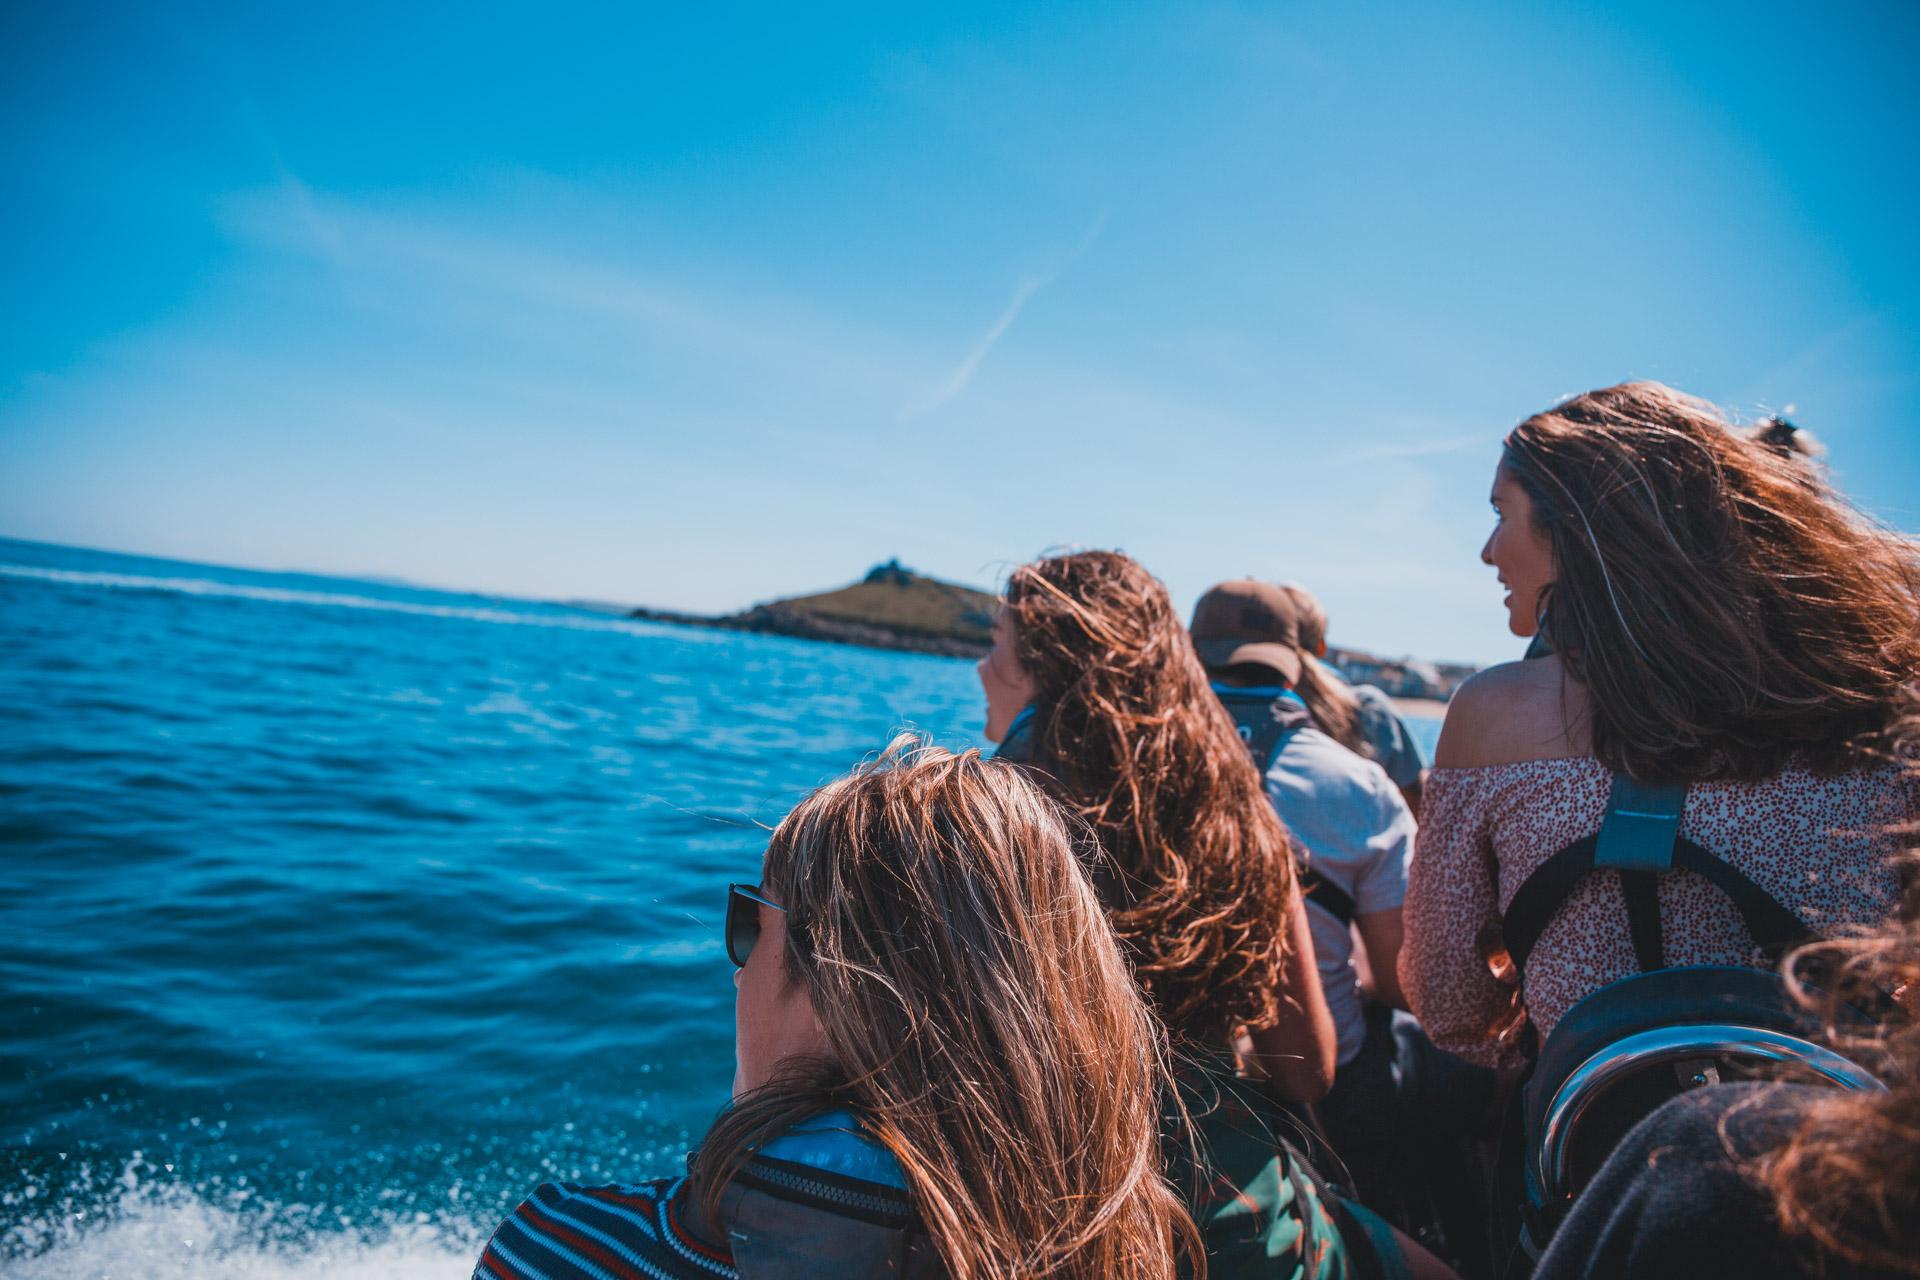 Blue Thunder Rib Rides Boat trips around the island st ives